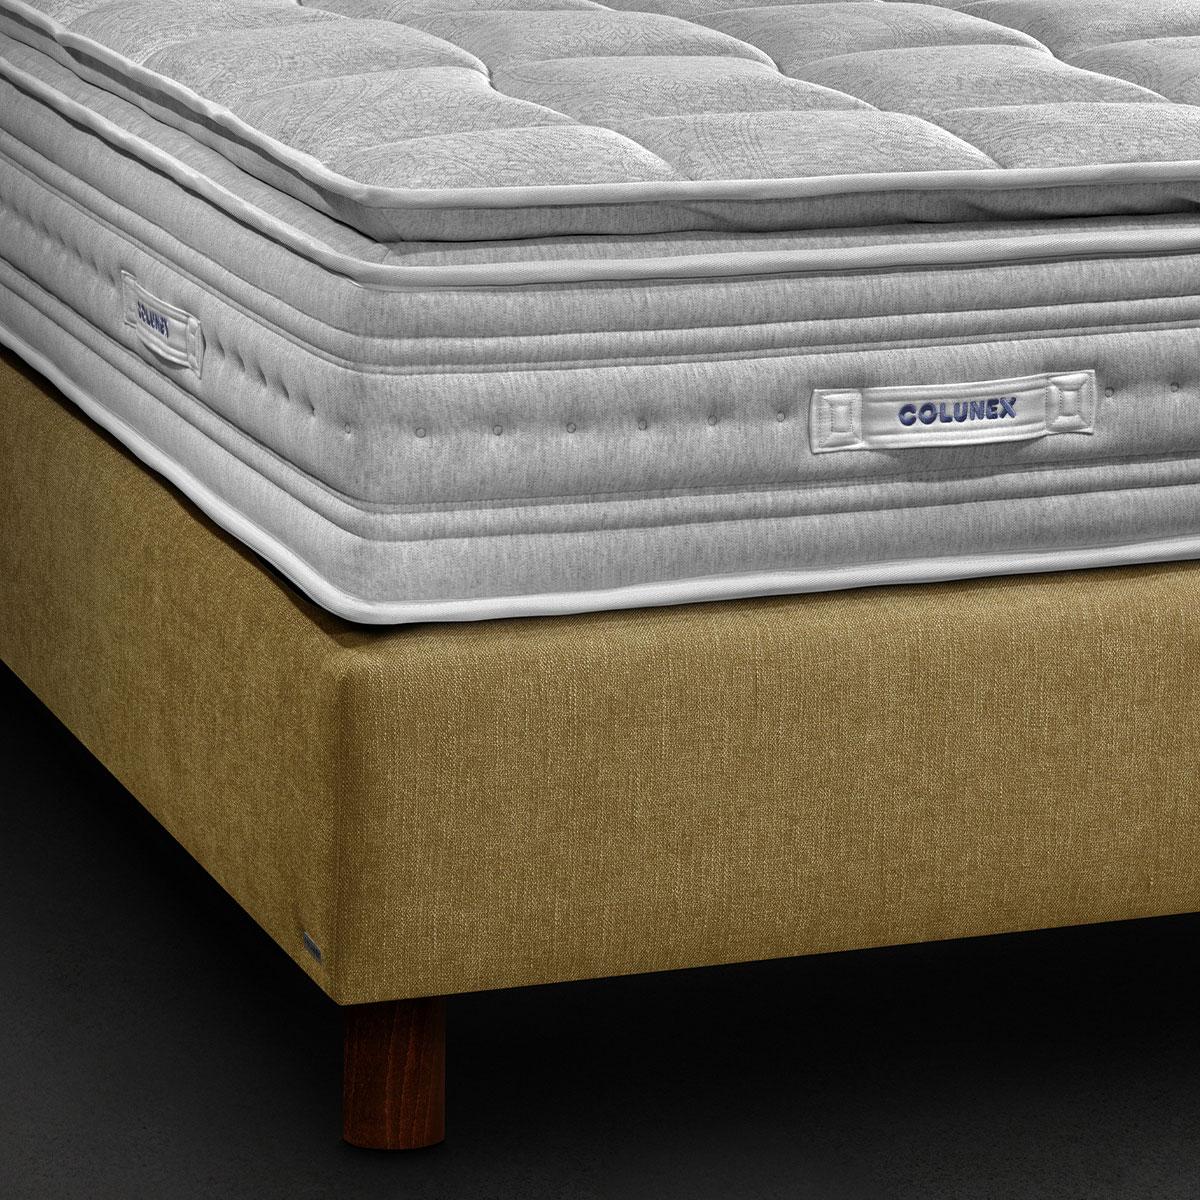 chandon extra Matela Chandon Extra colunex chandon extra mattress 01 2